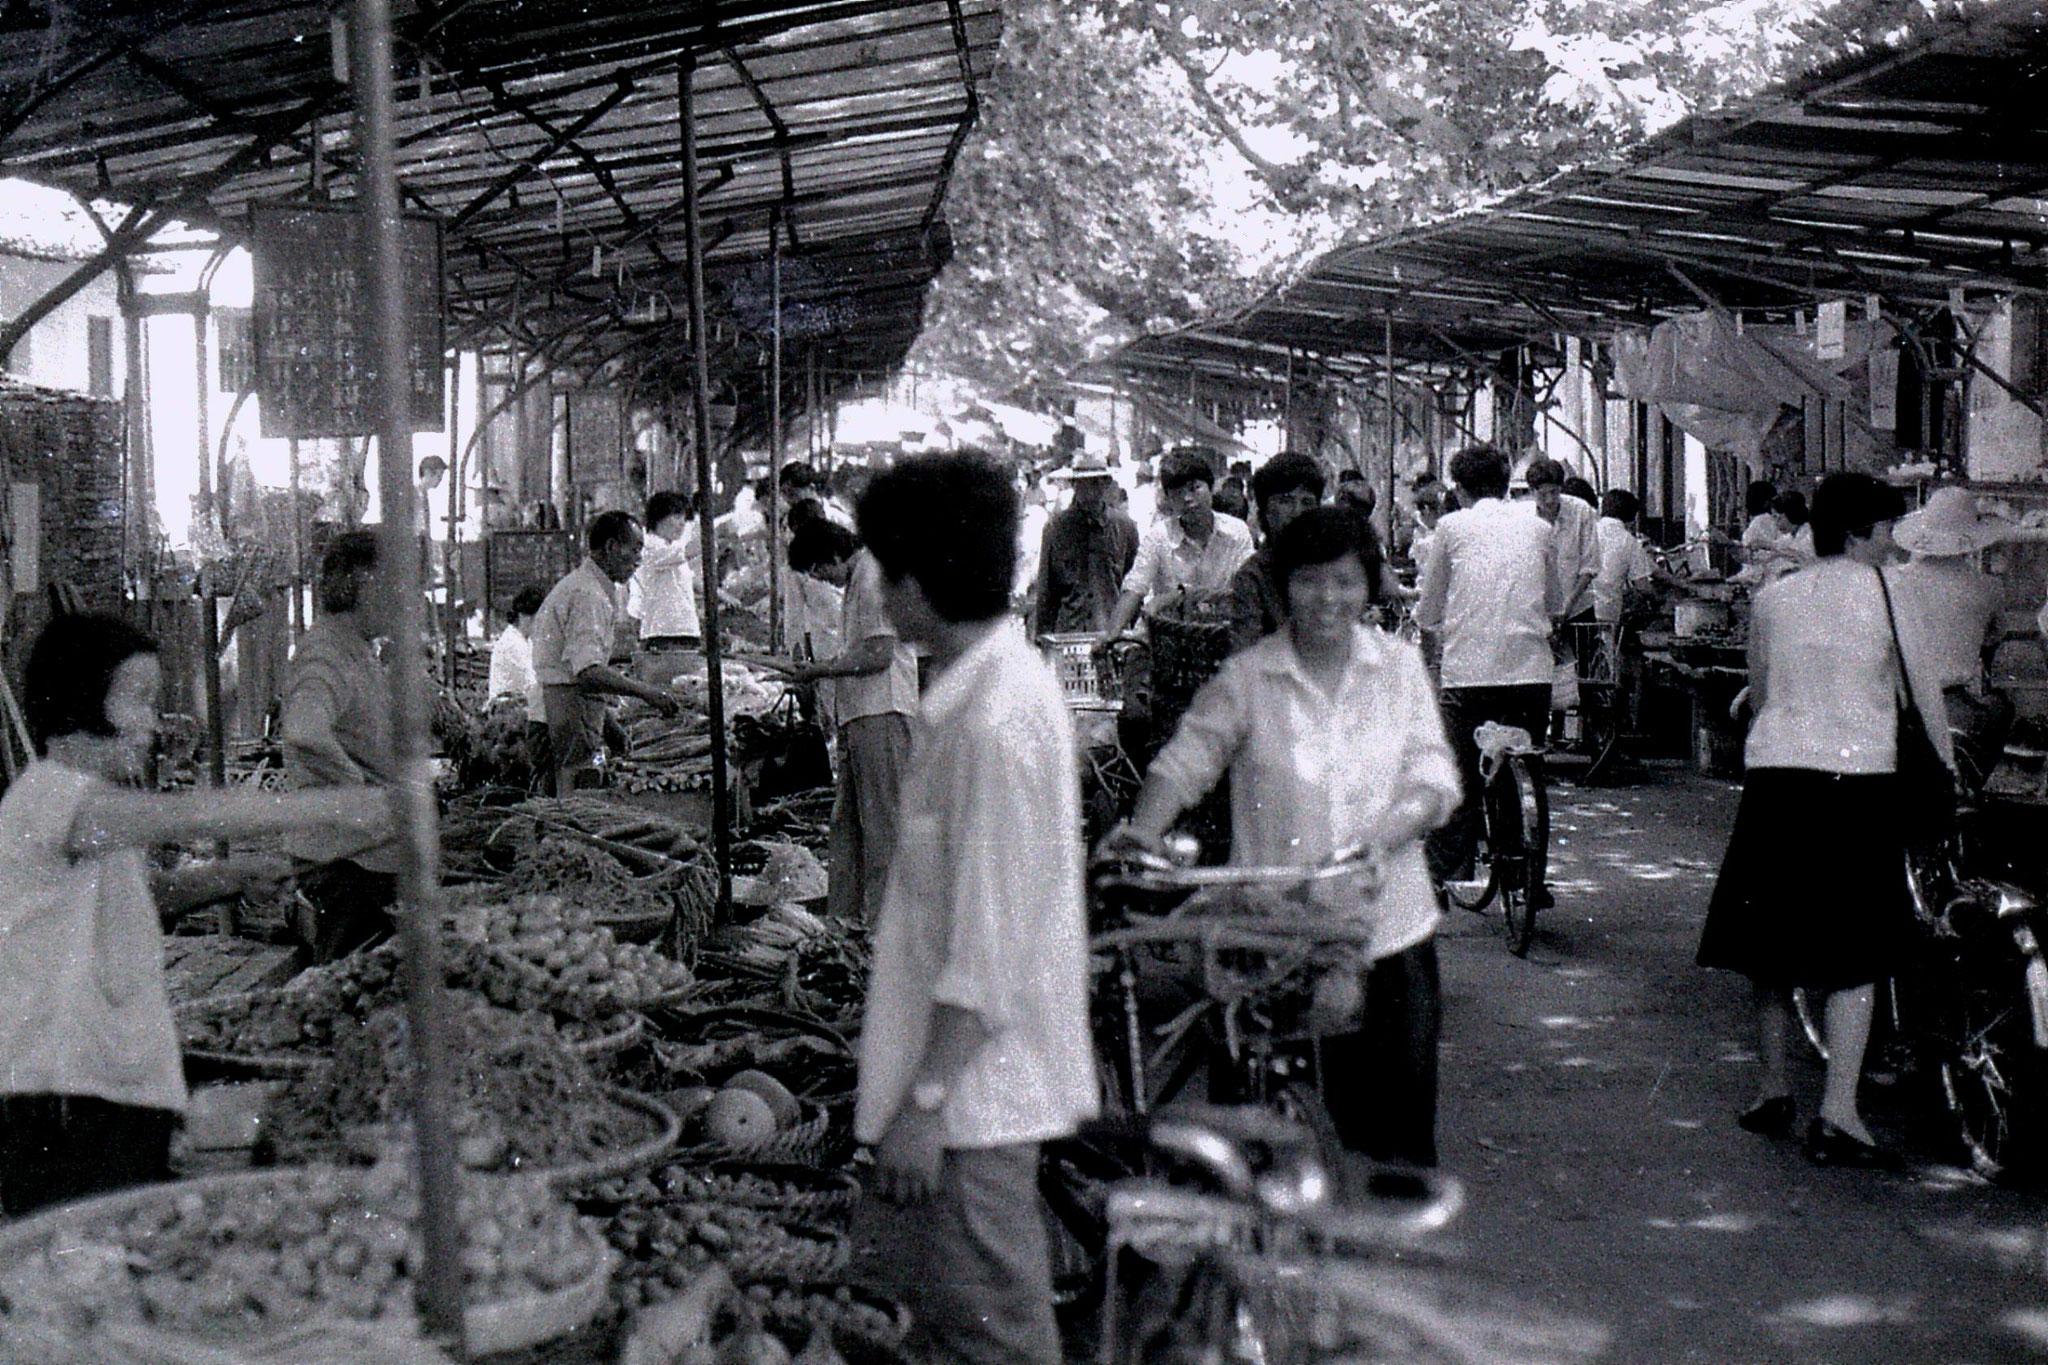 27/6/1989: 30: Shaoxing market